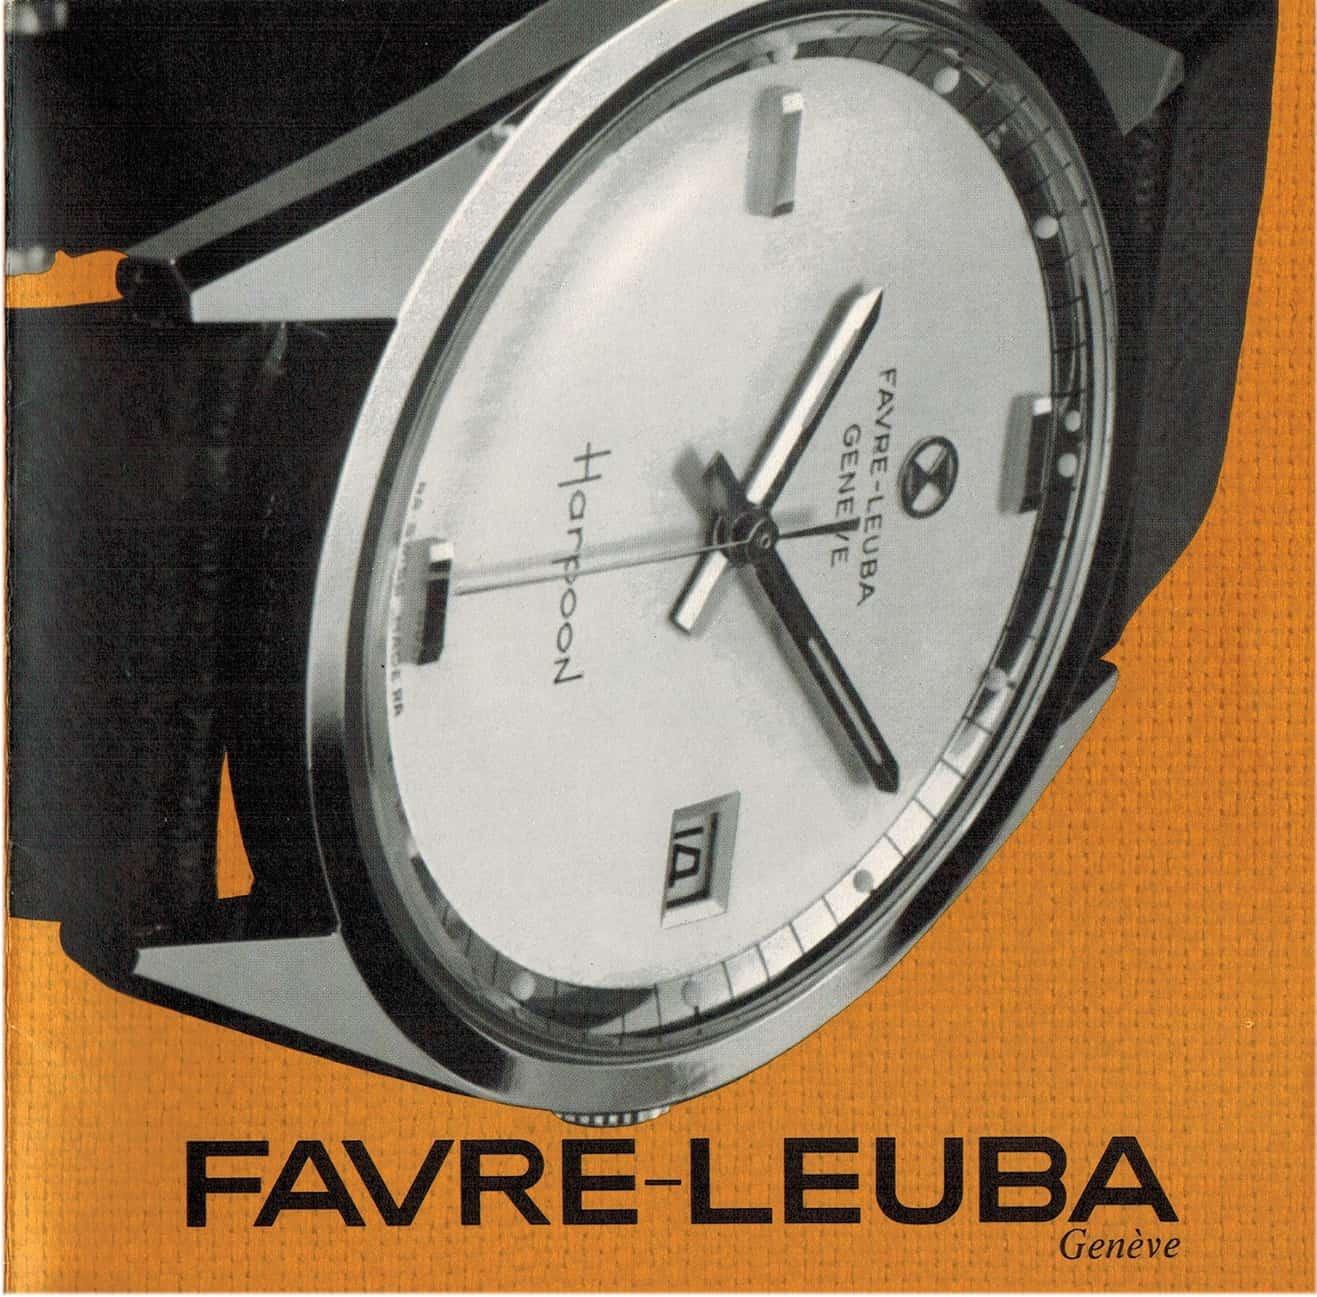 Uhrenkatalog von 1968